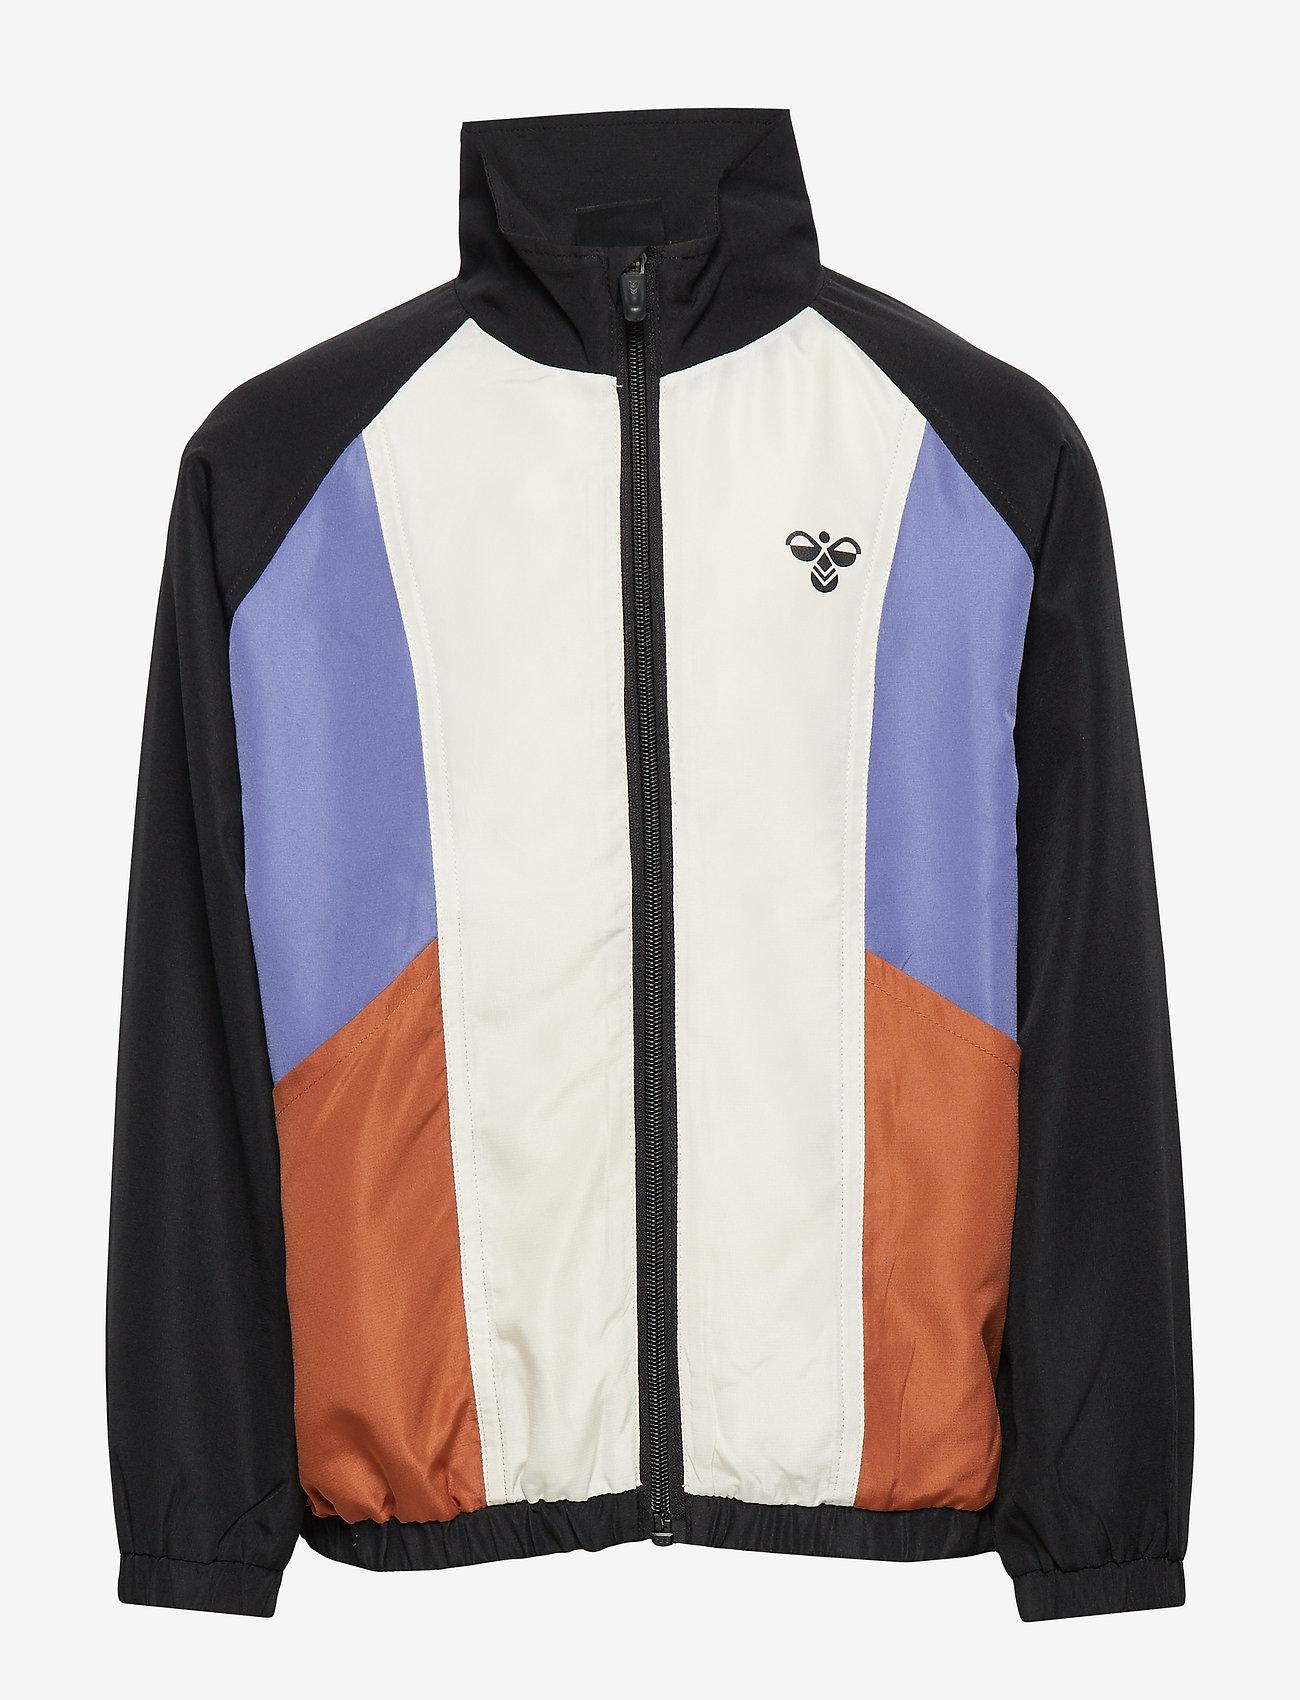 Hummel - hmlVIGDIS ZIP JACKET - sweaters - black - 0